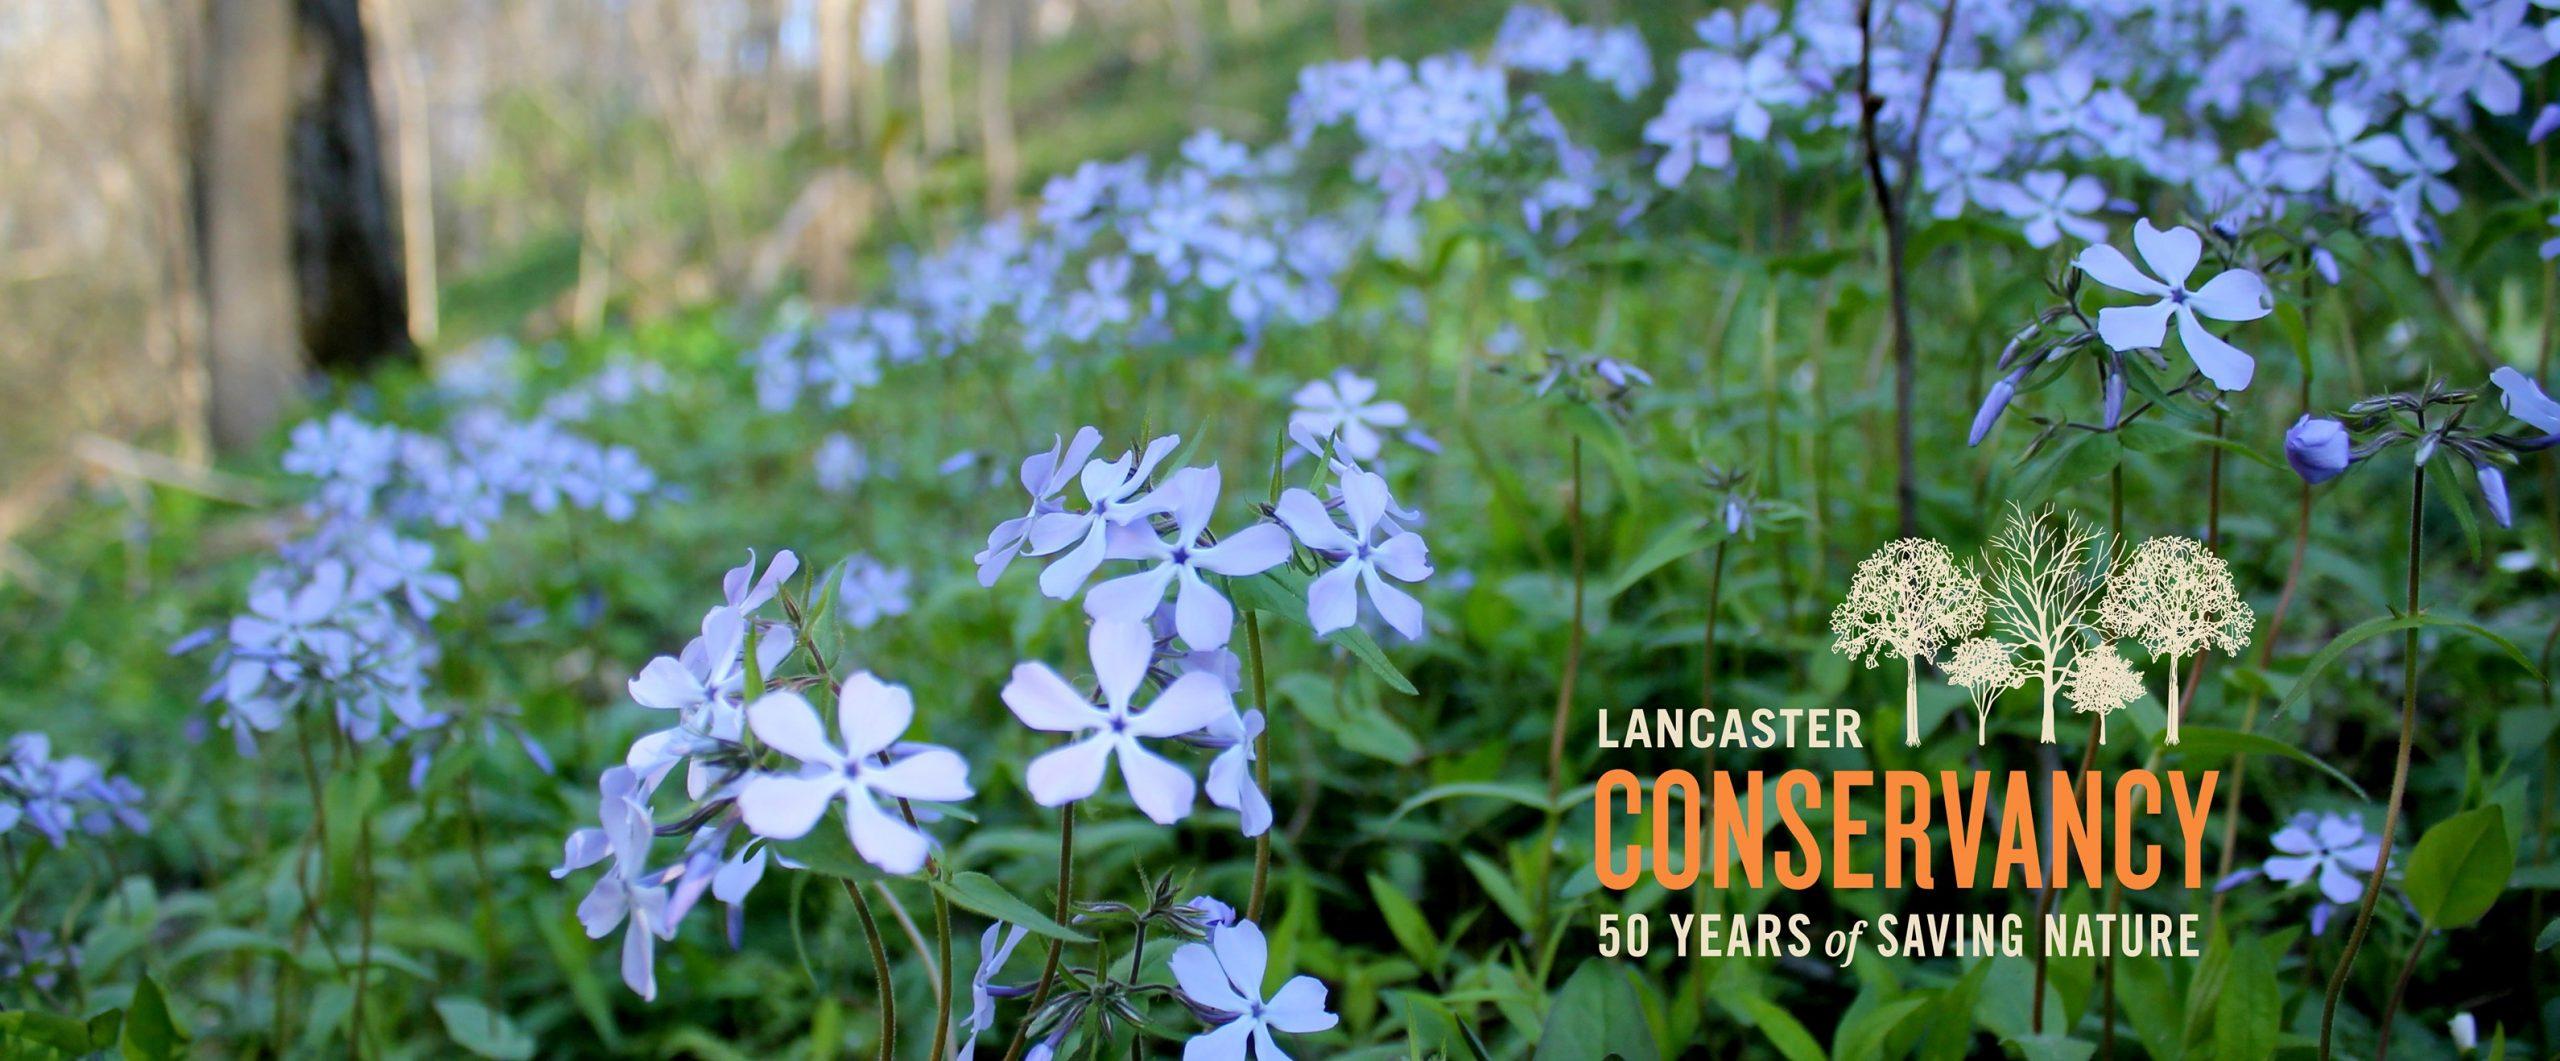 lancaster conservancy banner